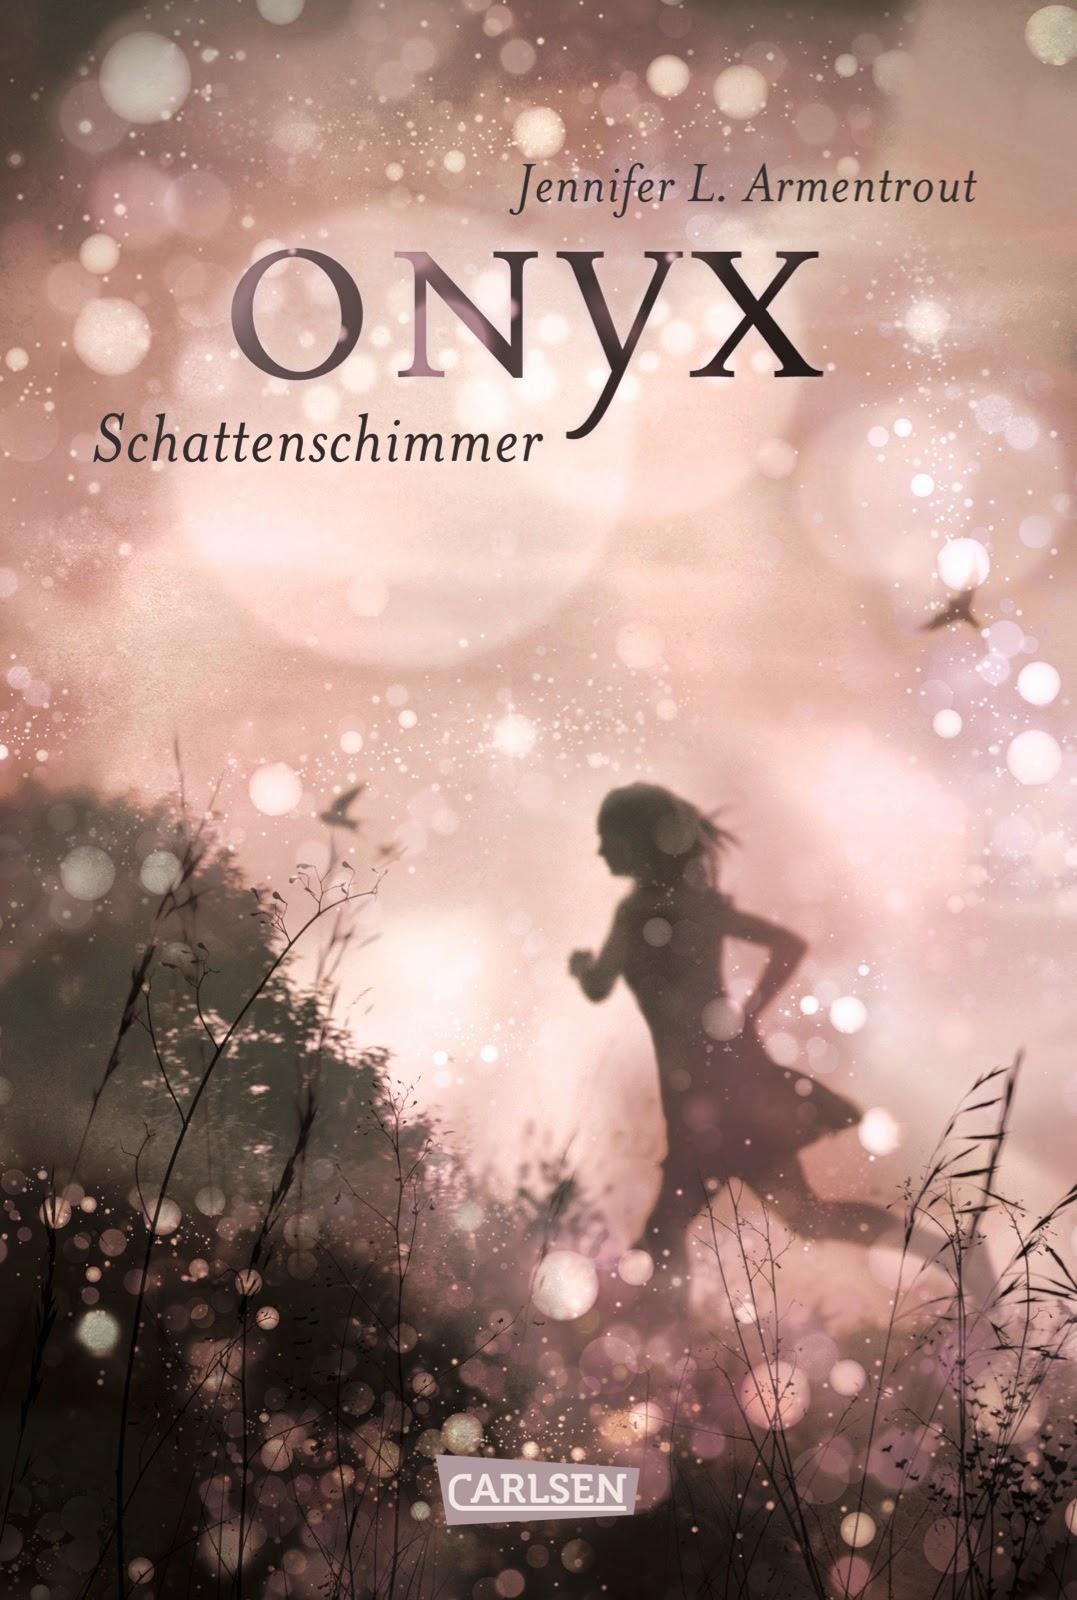 http://www.amazon.de/Obsidian-Band-2-Onyx-Schattenschimmer/dp/3551583323/ref=sr_1_1_twi_2?ie=UTF8&qid=1424530319&sr=8-1&keywords=onyx